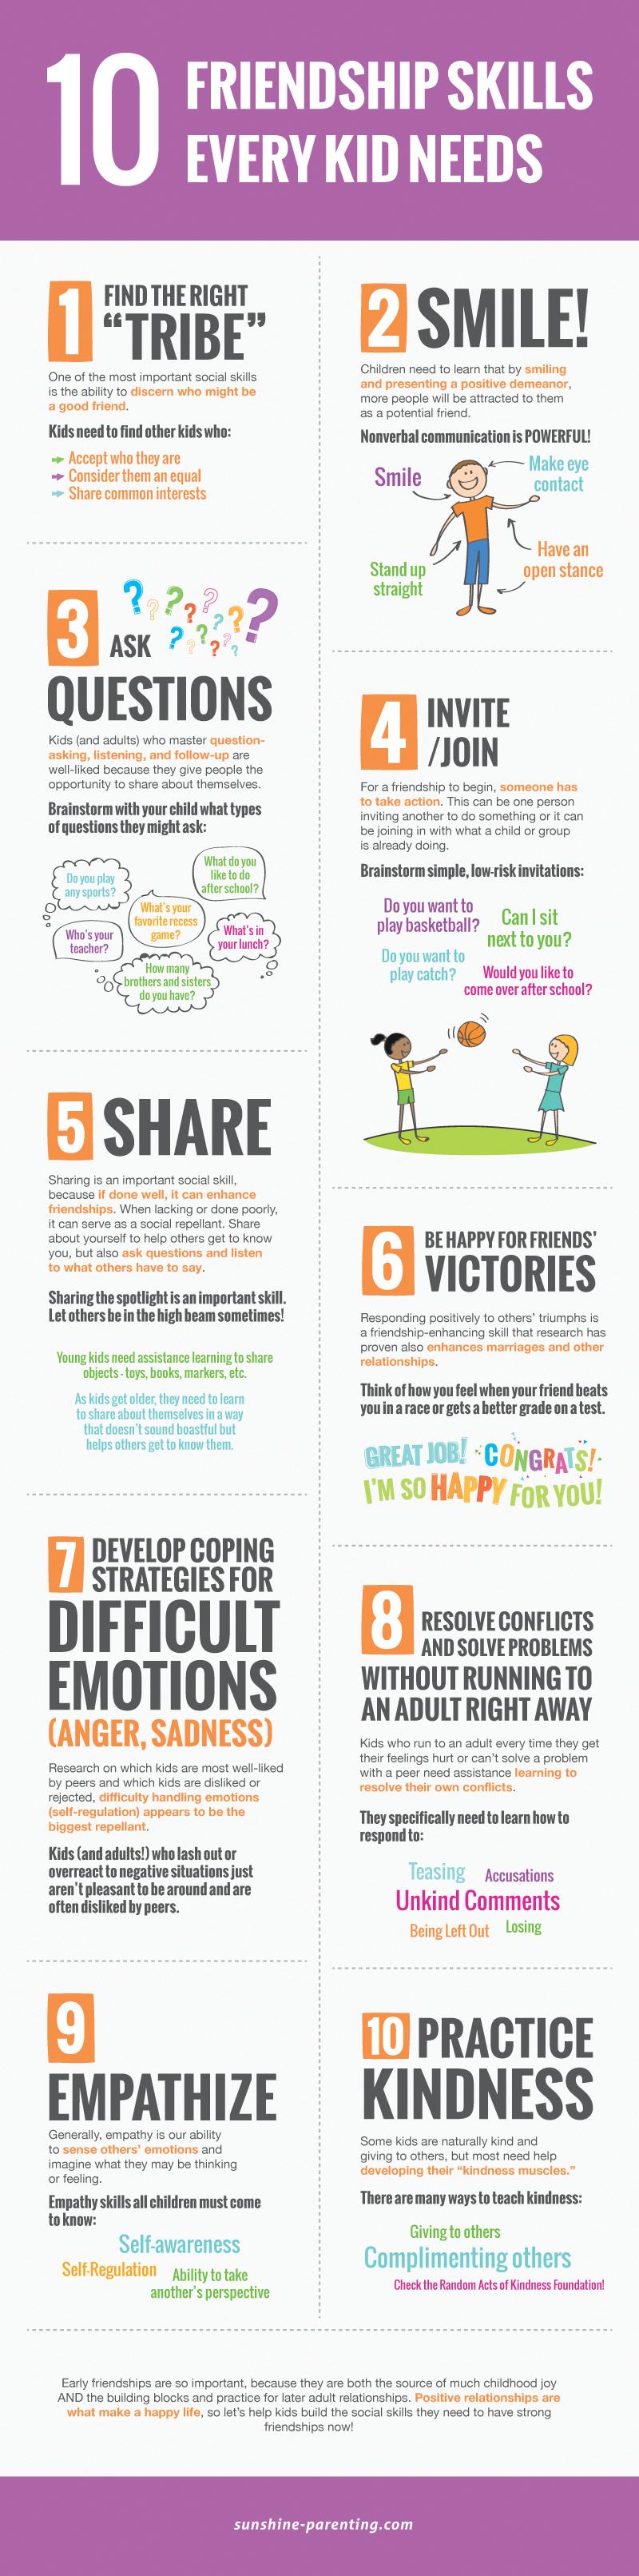 10 Friendship Skills Infographic